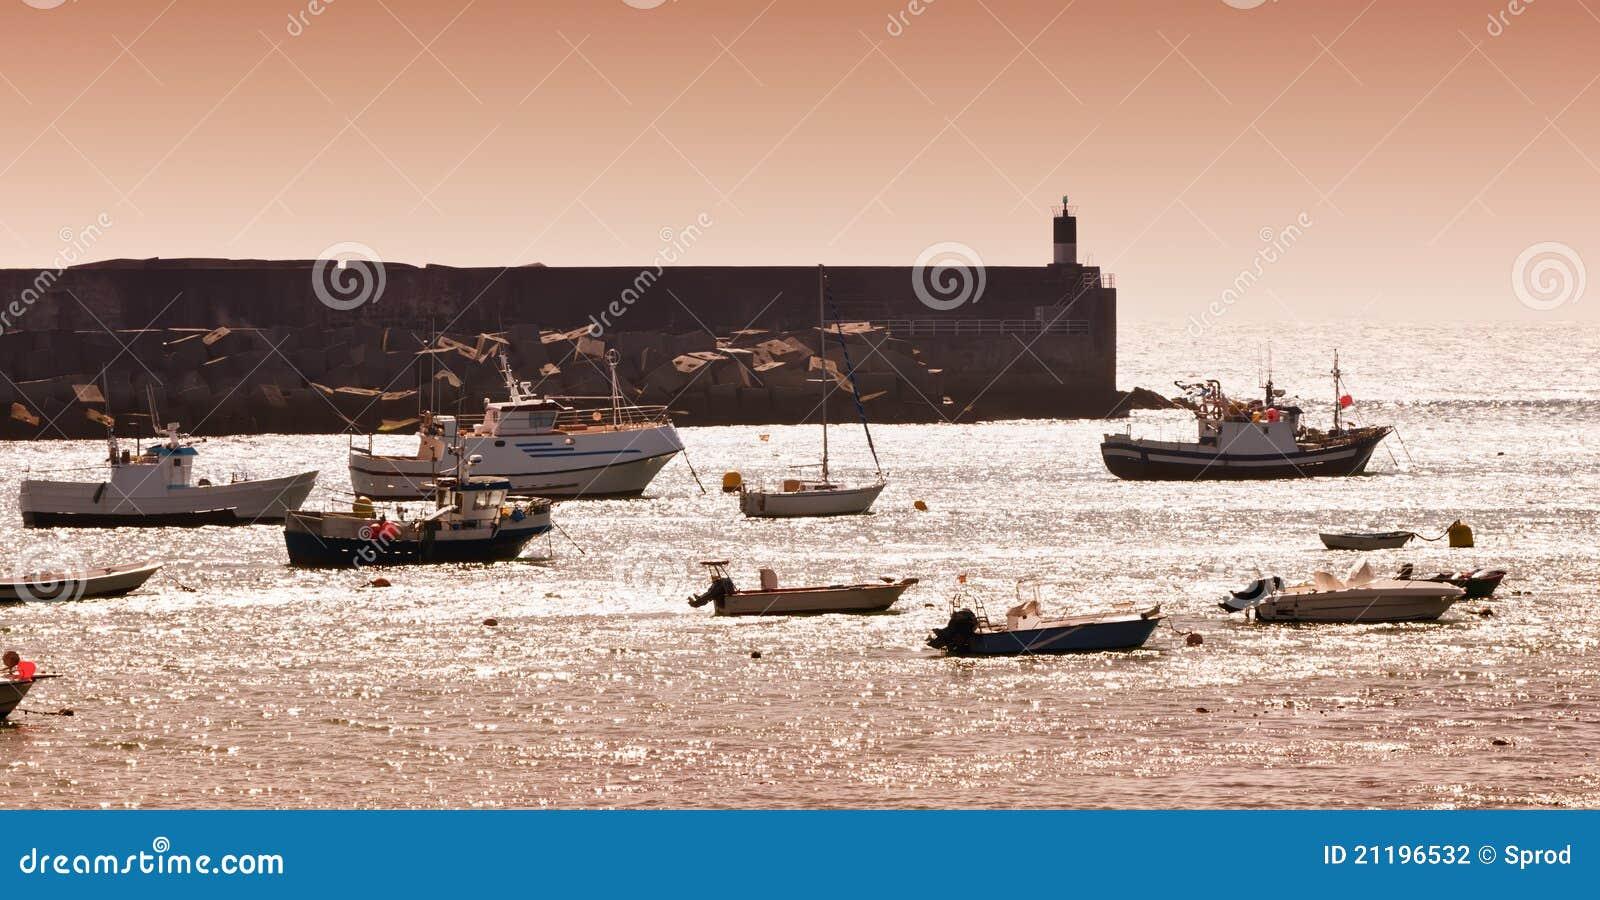 Galicia fishing harbour